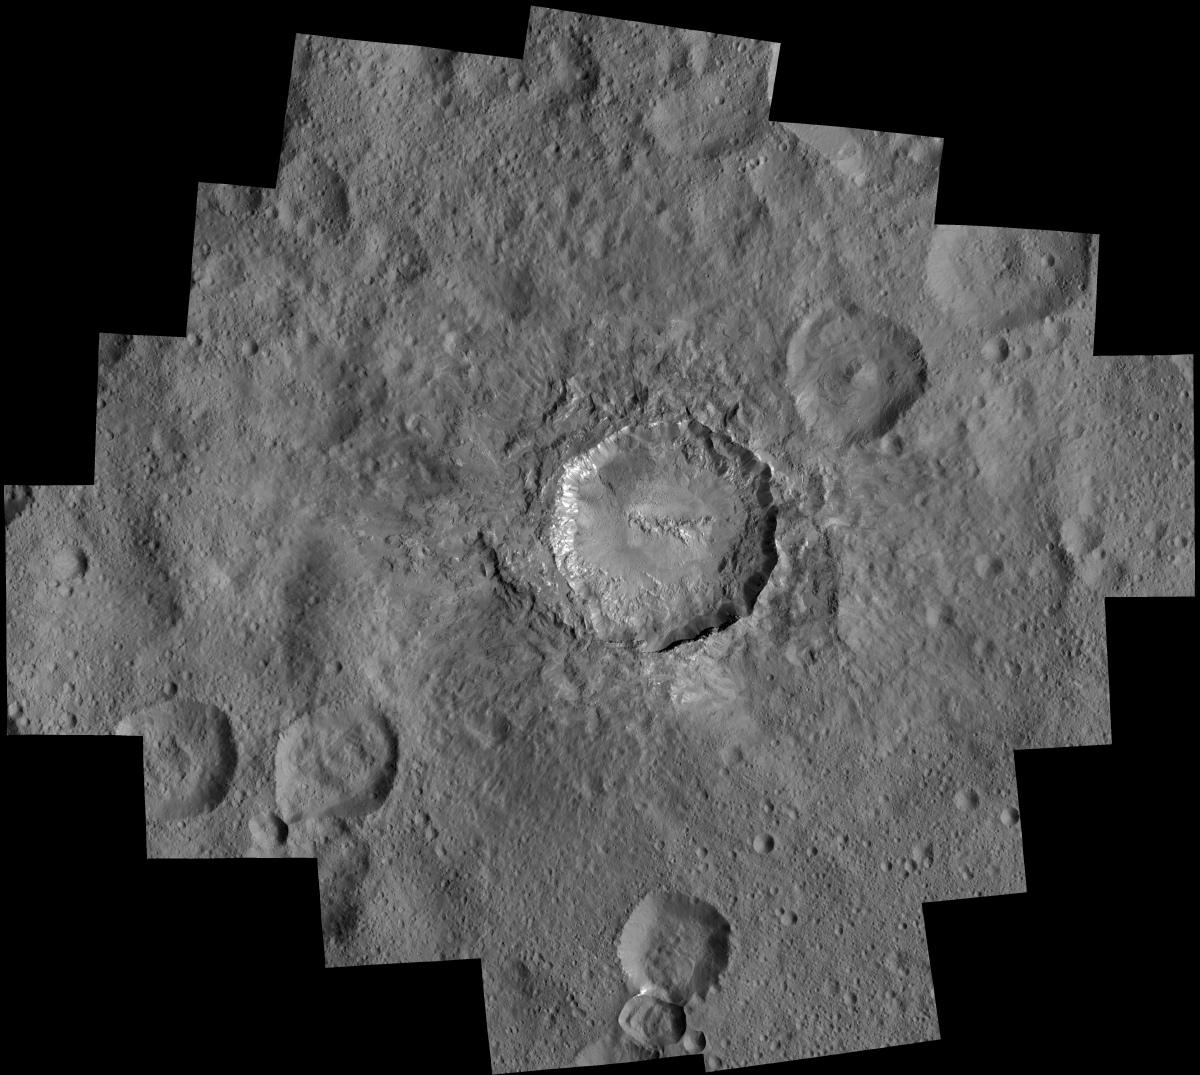 Ceres' Haulani Crater Mosaic